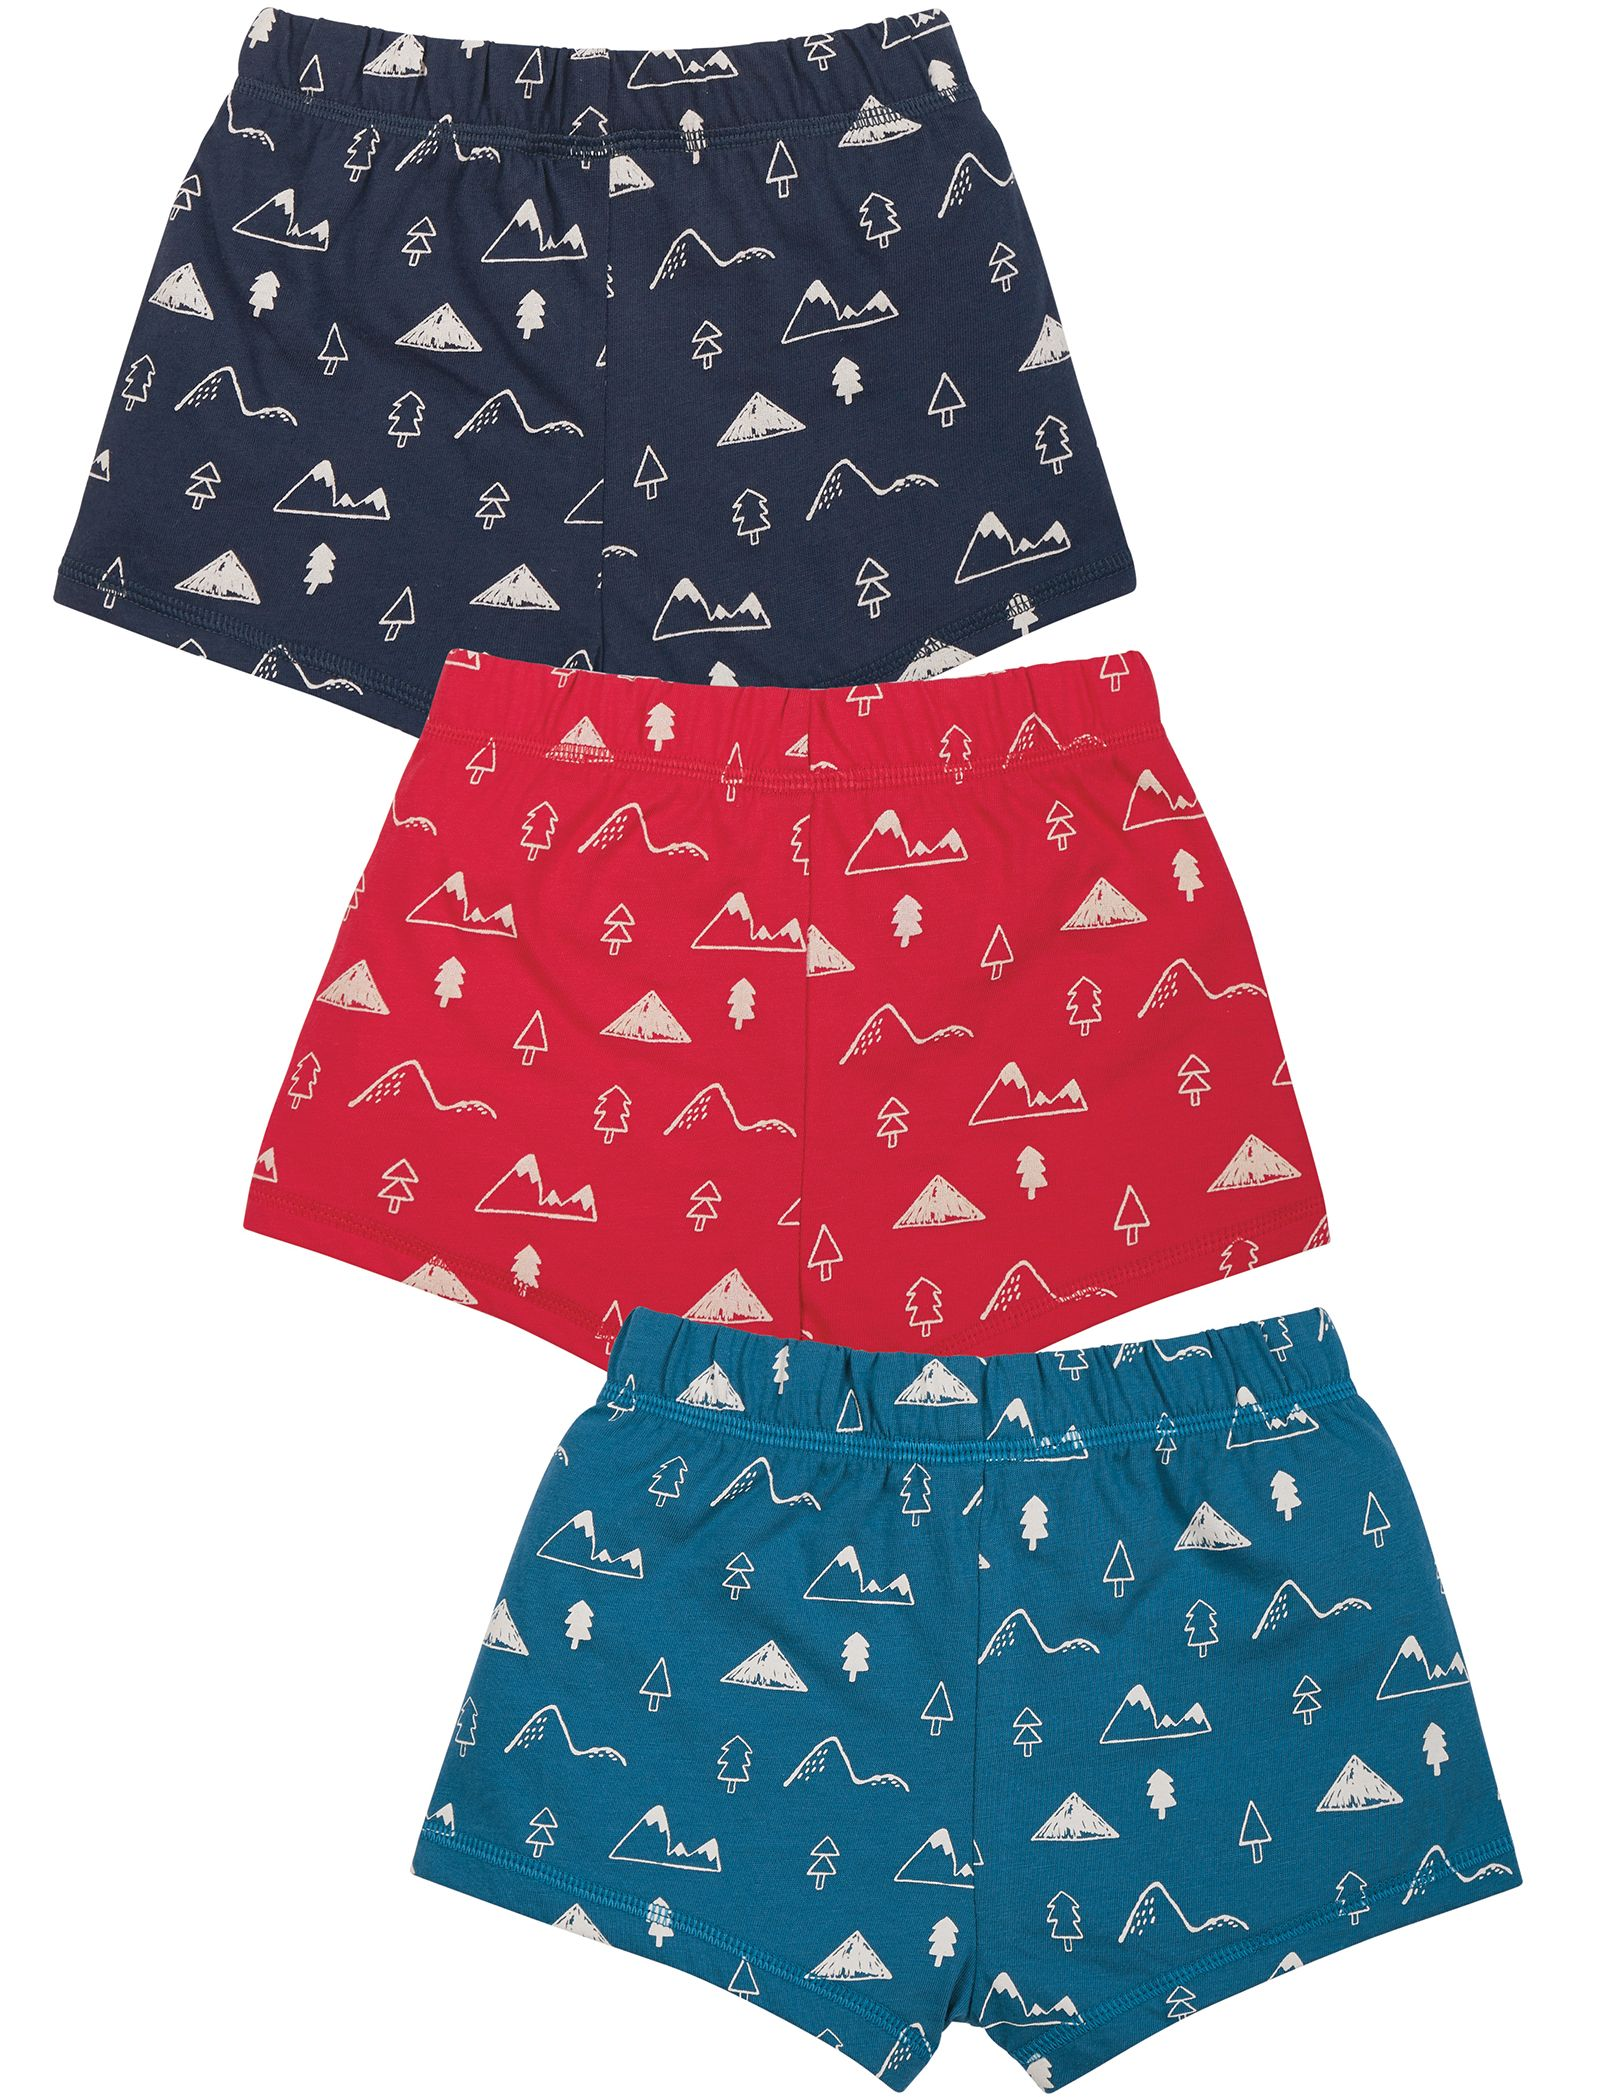 Jungs-Shorts im 3er-Pack mit Natur-Print